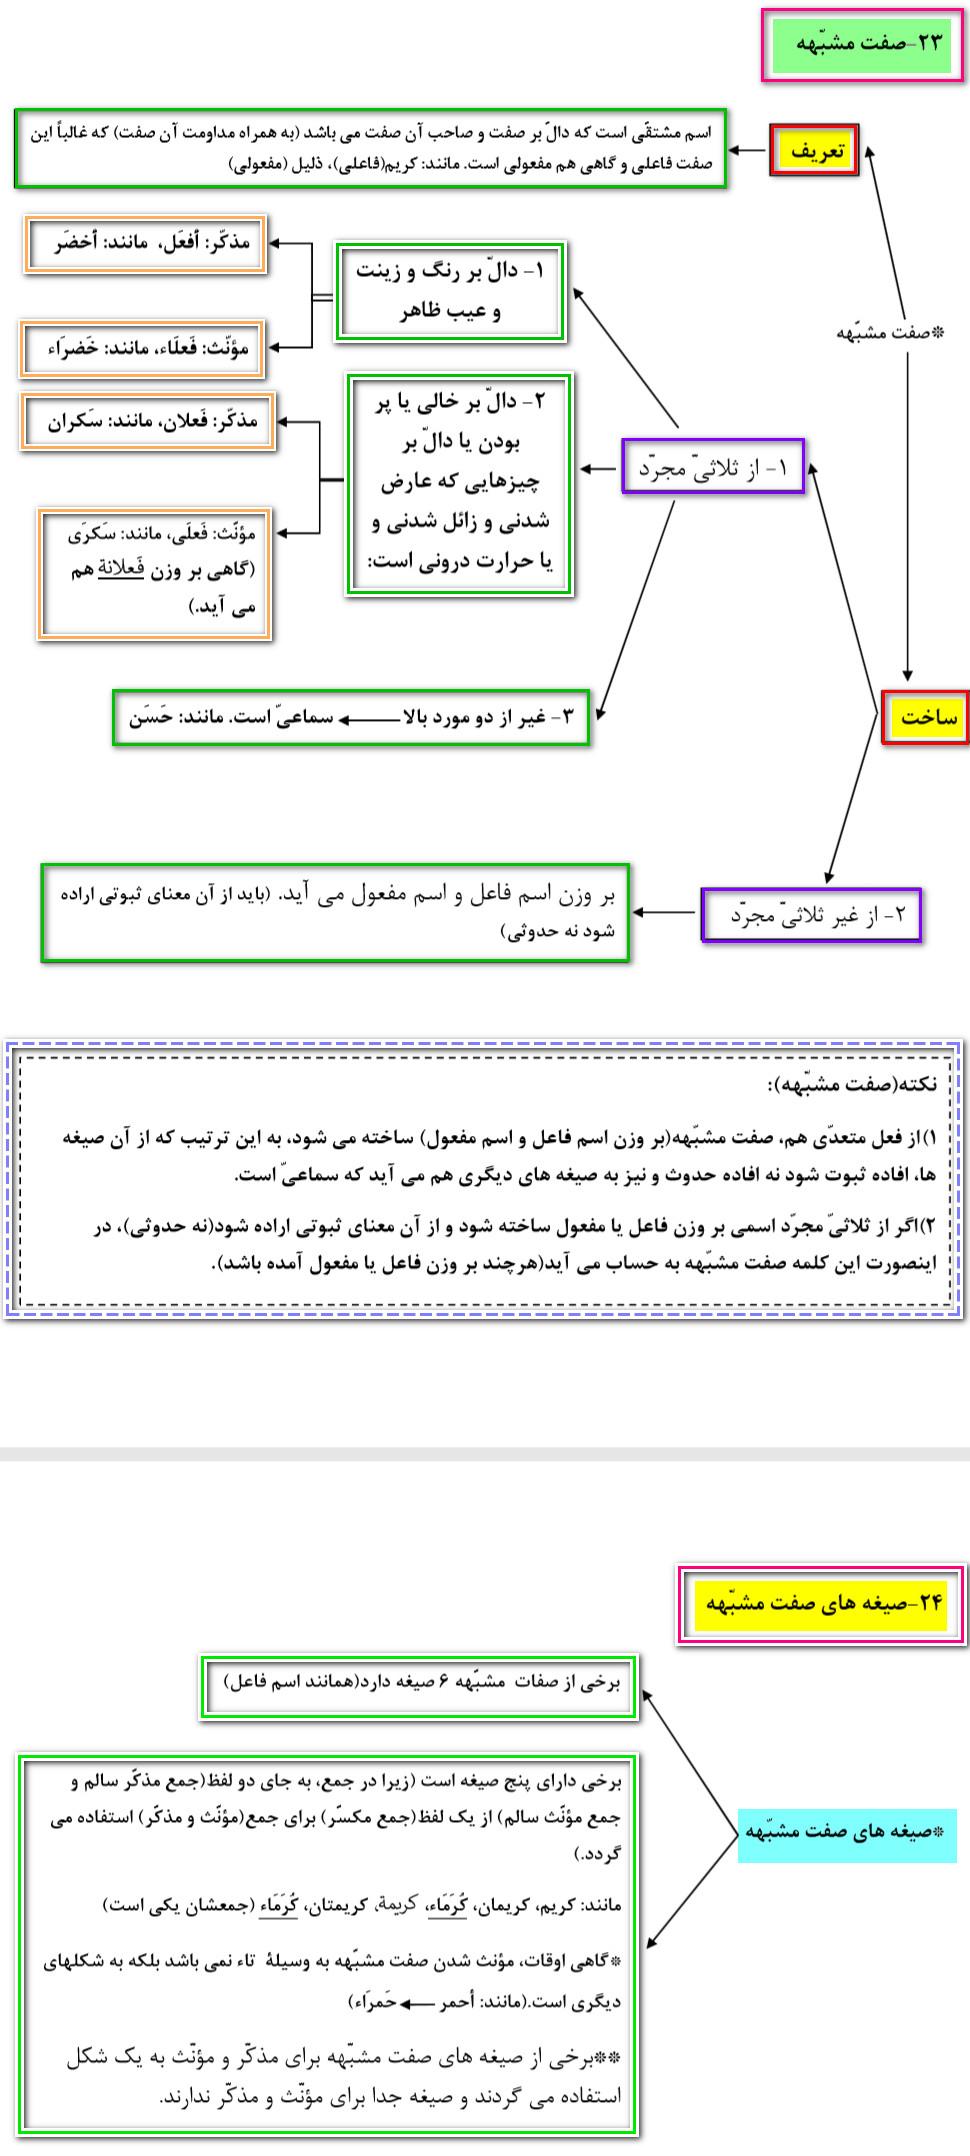 http://s8.picofile.com/file/8358137934/sefat_moshabbah.jpg